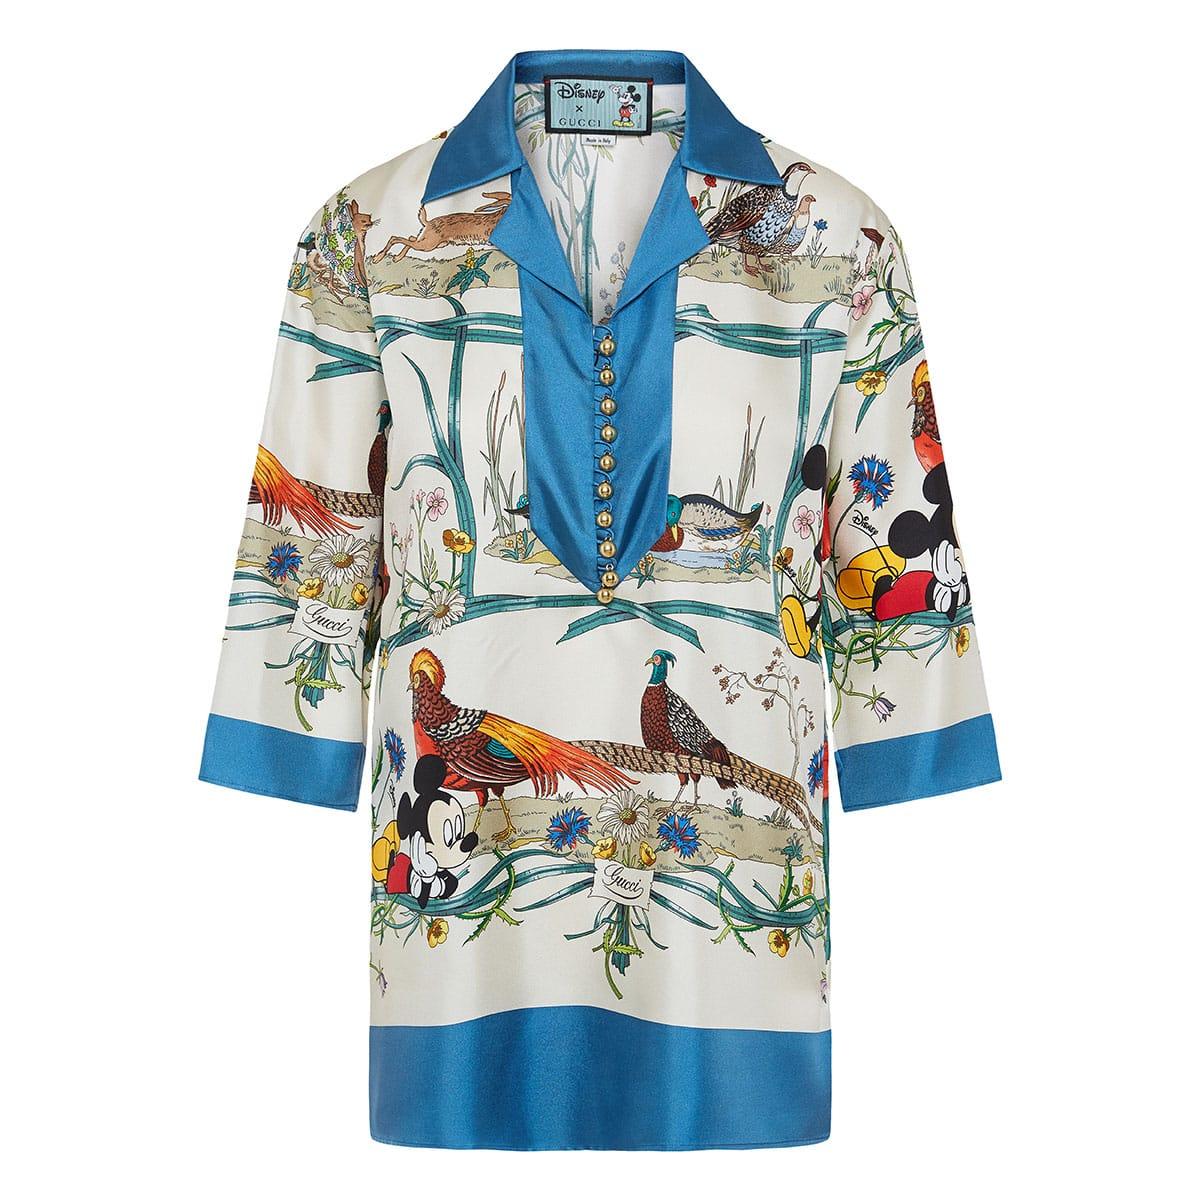 Disney x Gucci printed twill shirt